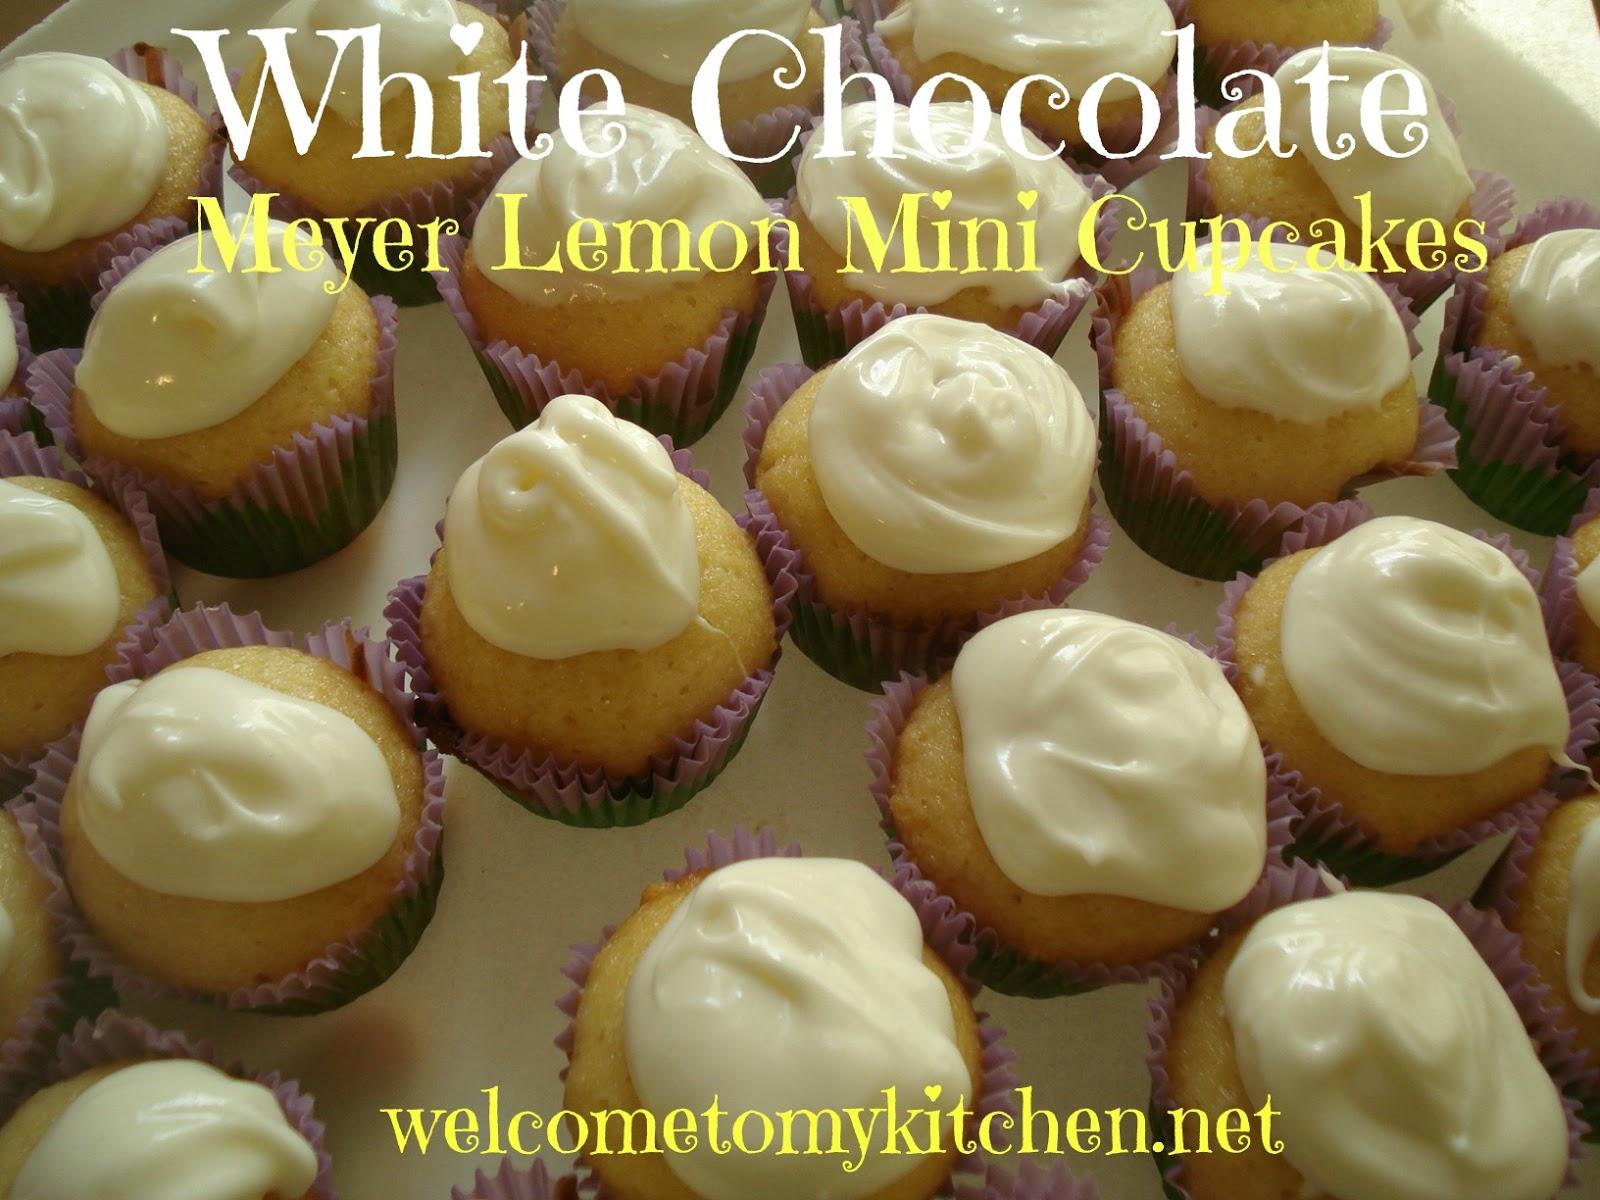 Dove Chocolate Discoveries White Chocolate Meyer Lemon Mini